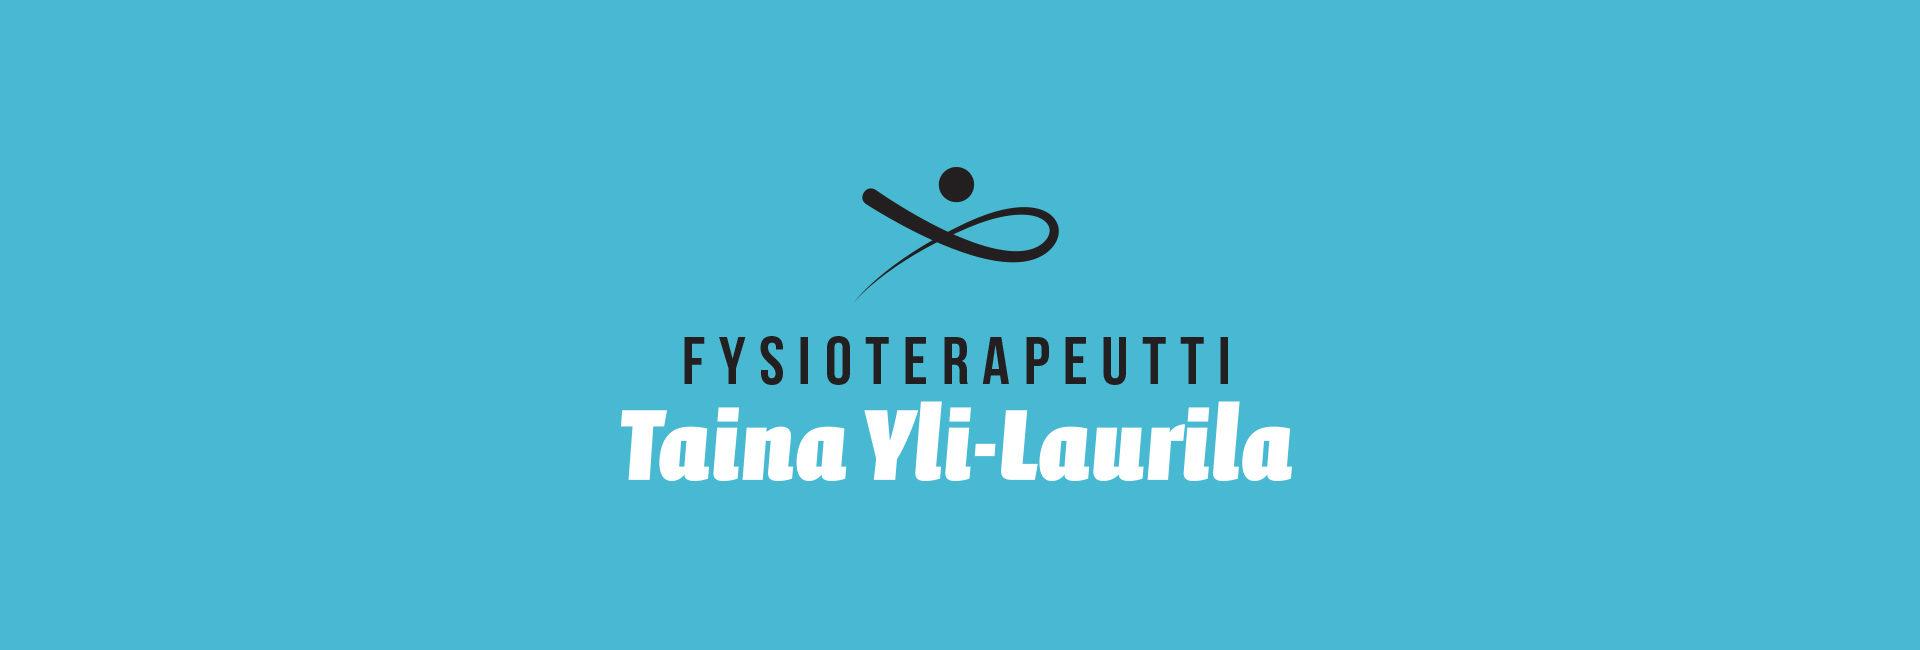 Fysioterapeutti Taina Yli-Laurila